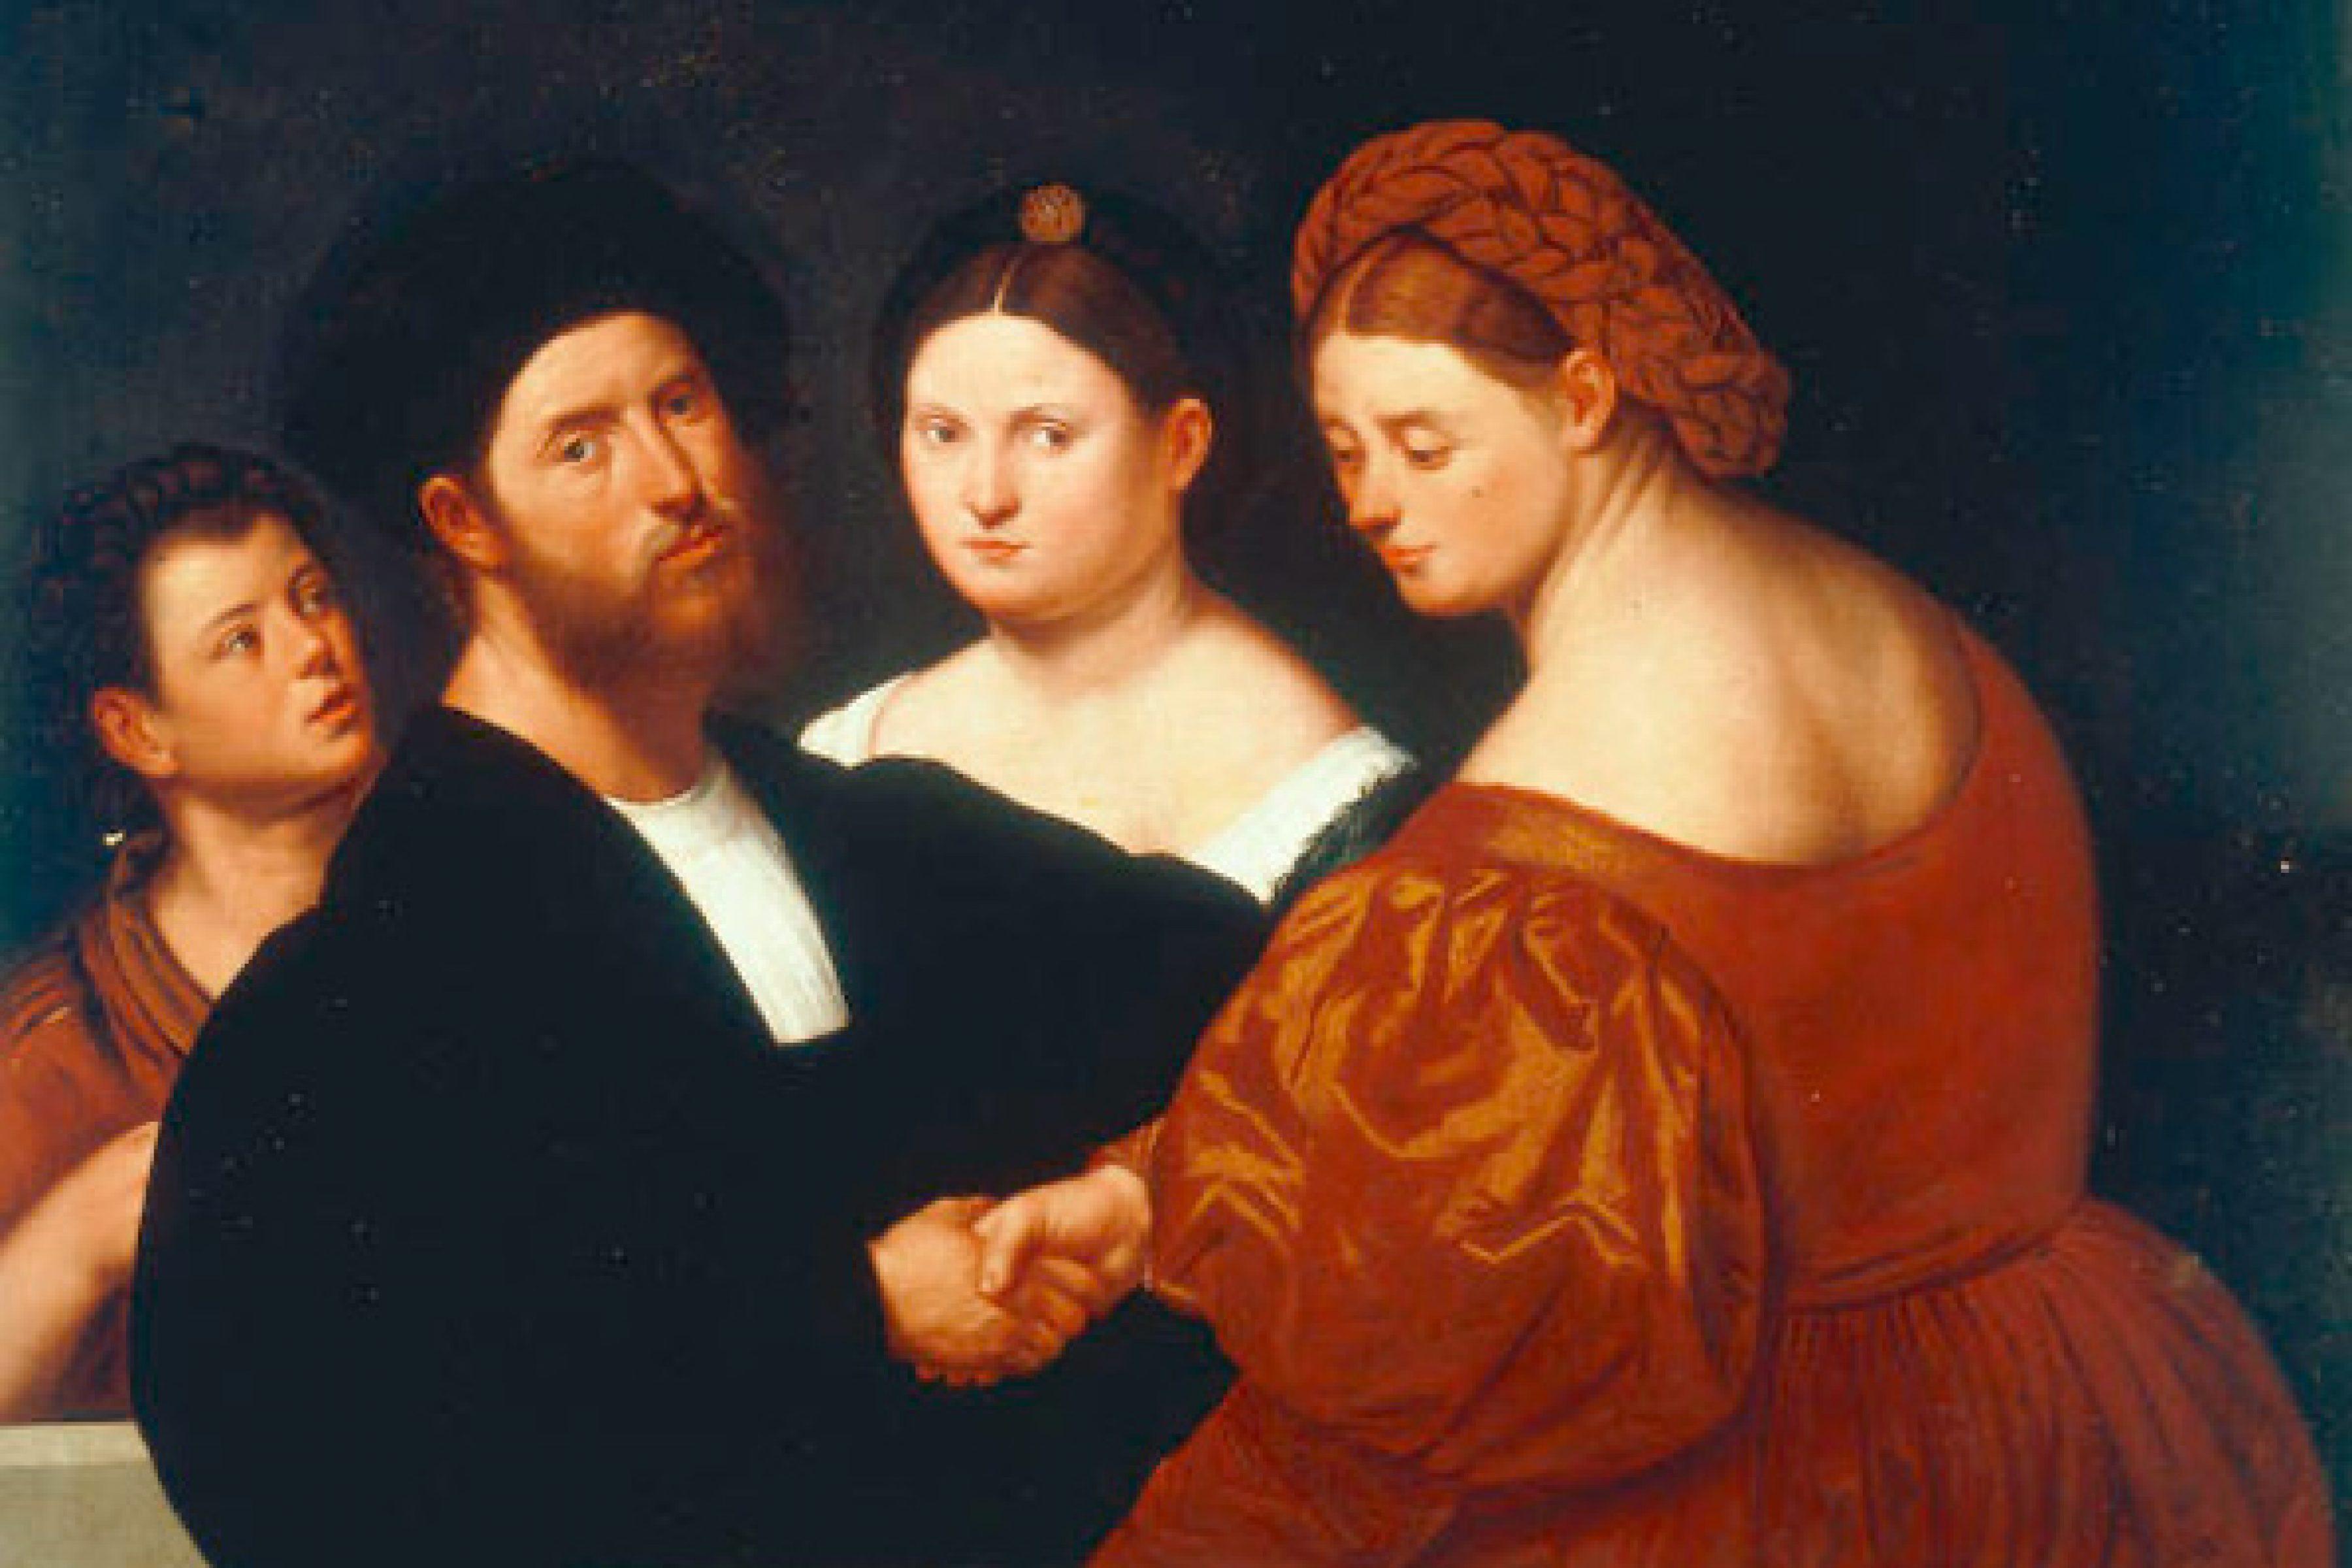 2-M140-A3-1520  B.Licinio, Familienbild  Licinio, Bernardino um 1489 - vor 1565, Kopie nach verlorenem Original(?). 'Familienbild', undat. Oel auf Leinwand, 100 x 124 cm. Inv.Nr. 802 Venedig, Galleria dell'Accademia.  E:  B.Licinio / Family Portr./ Paint./ C16  Licinio, Bernardino c.1489 - before 1565. Copy of lost original(?). 'Family portrait', undat. Oil on canvas, 100 x 124cm. Inv.no. 802 Venice, Galleria dell'Accademia.  F:  B. Licinio / Portrait de famille  Licinio, Bernardino , v. 1489 - av. 1565. Copie d'ap. original perdu. - 'Portrait de famille'. - Huile sur toile. H. 1,00 , L. 1,24. Inv.Nr. 802 Venise, Galleria dell'Accademia.